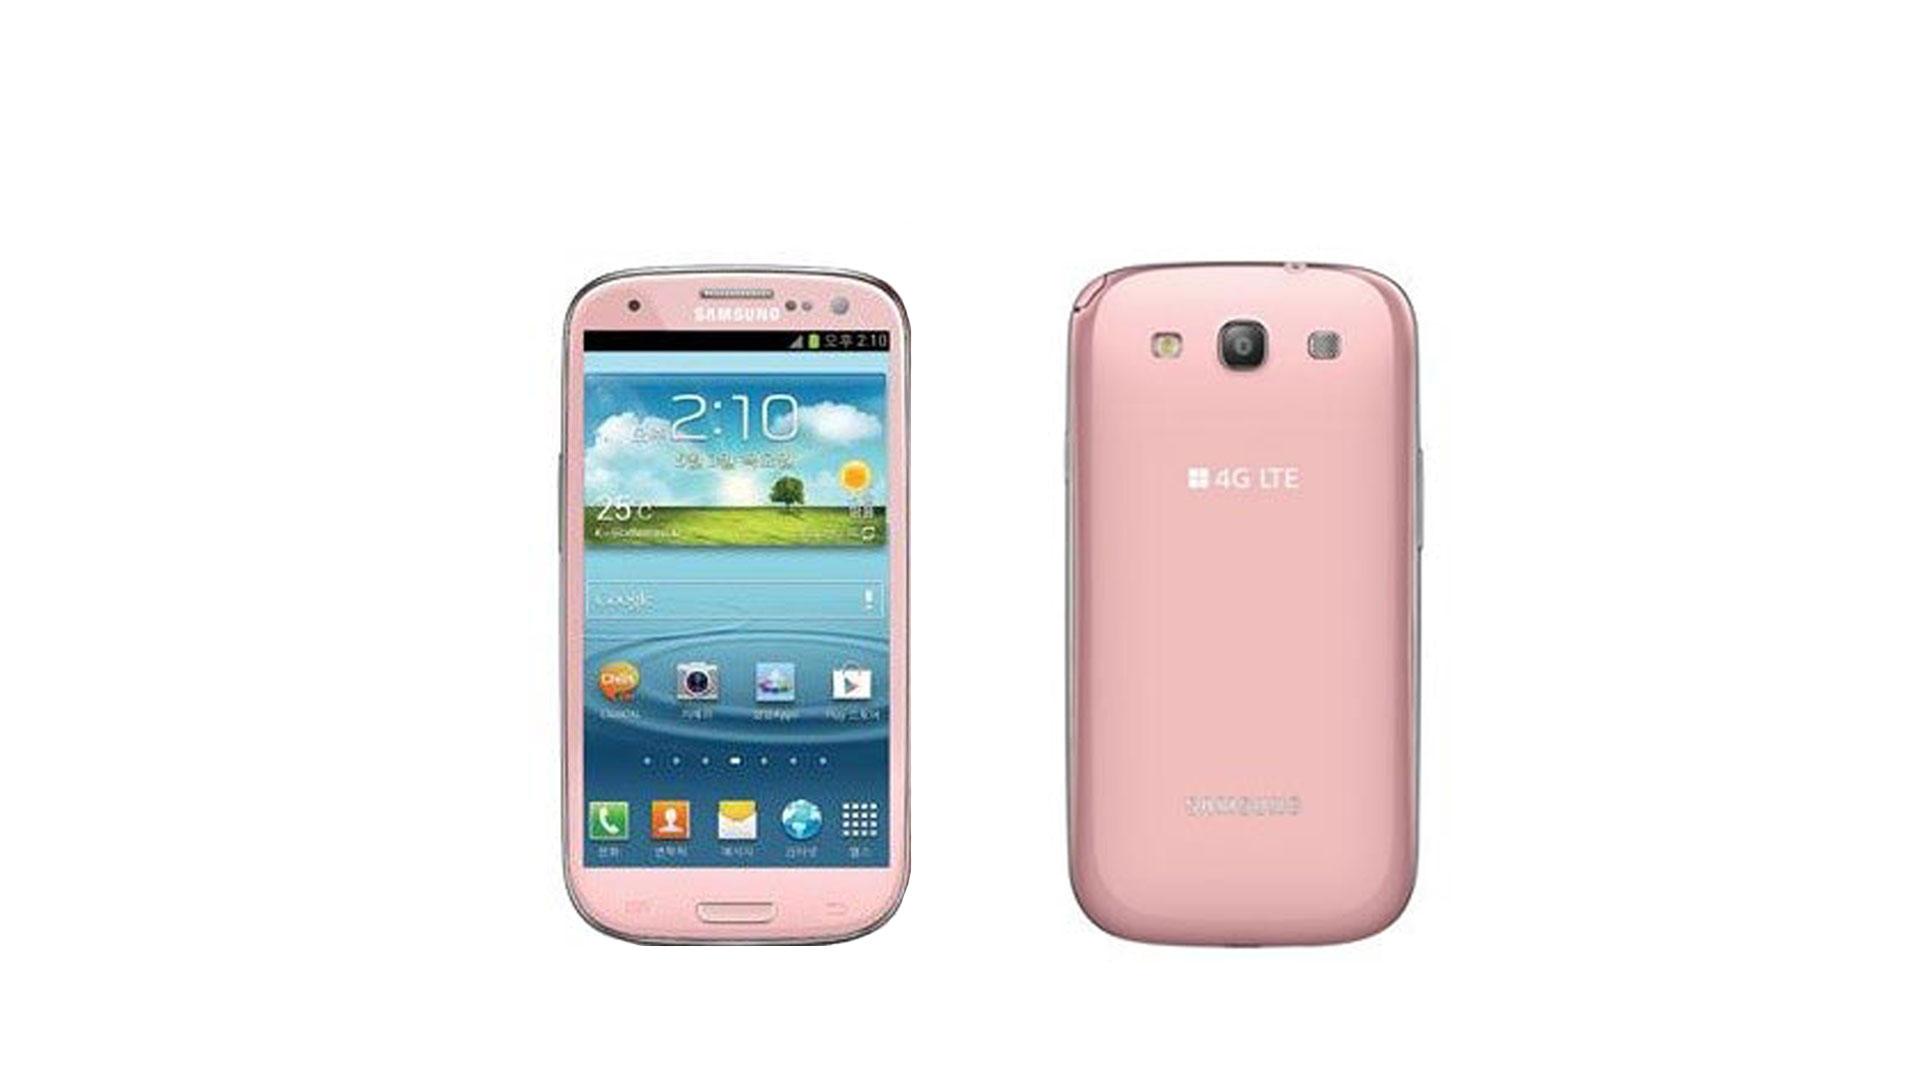 Samsung galaxy ace la fleur права администратора.